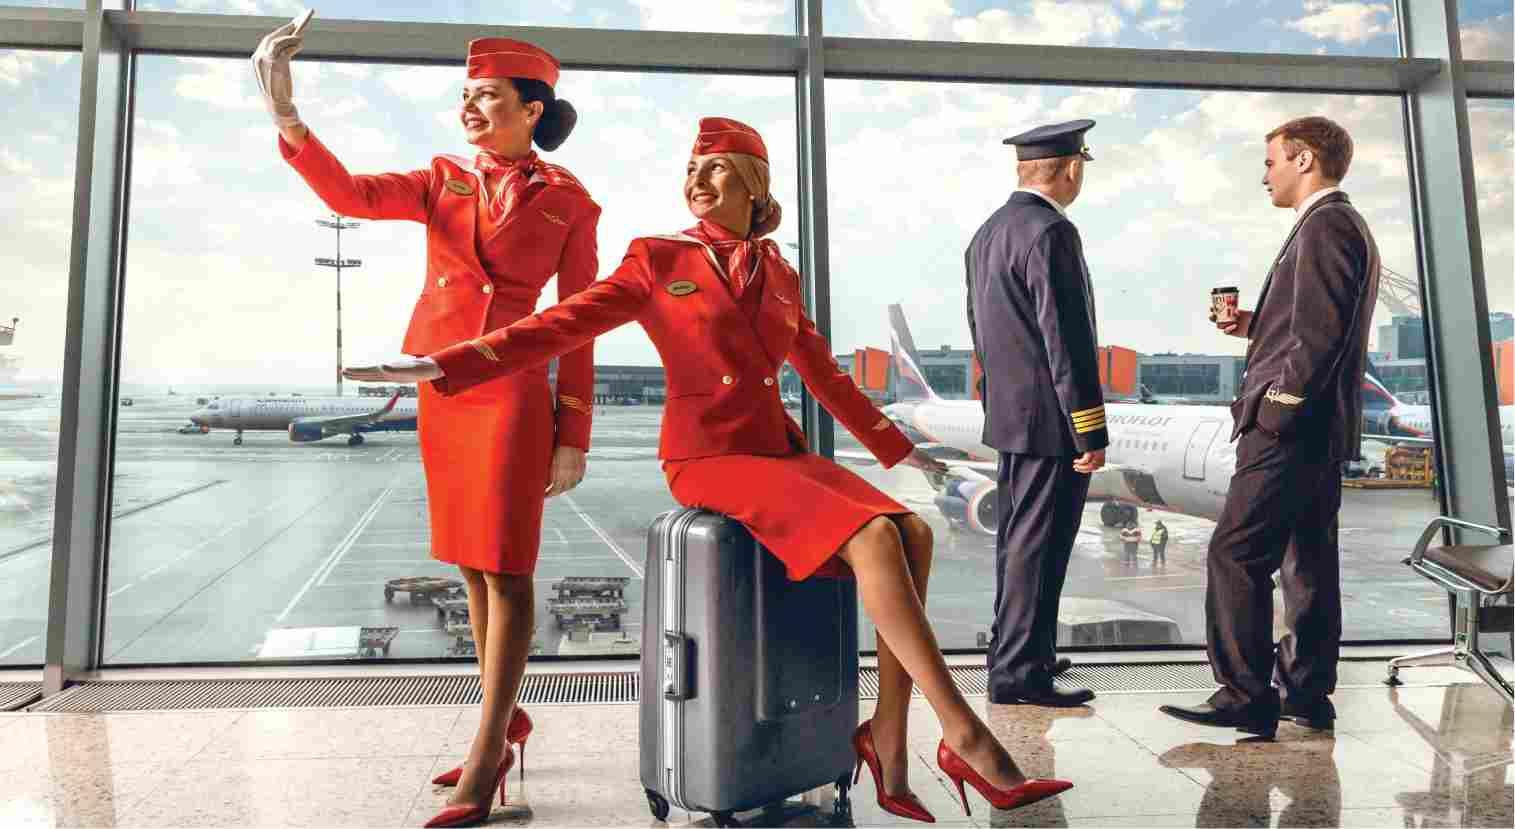 Фото стюардесс авиалинии франкфурта 6